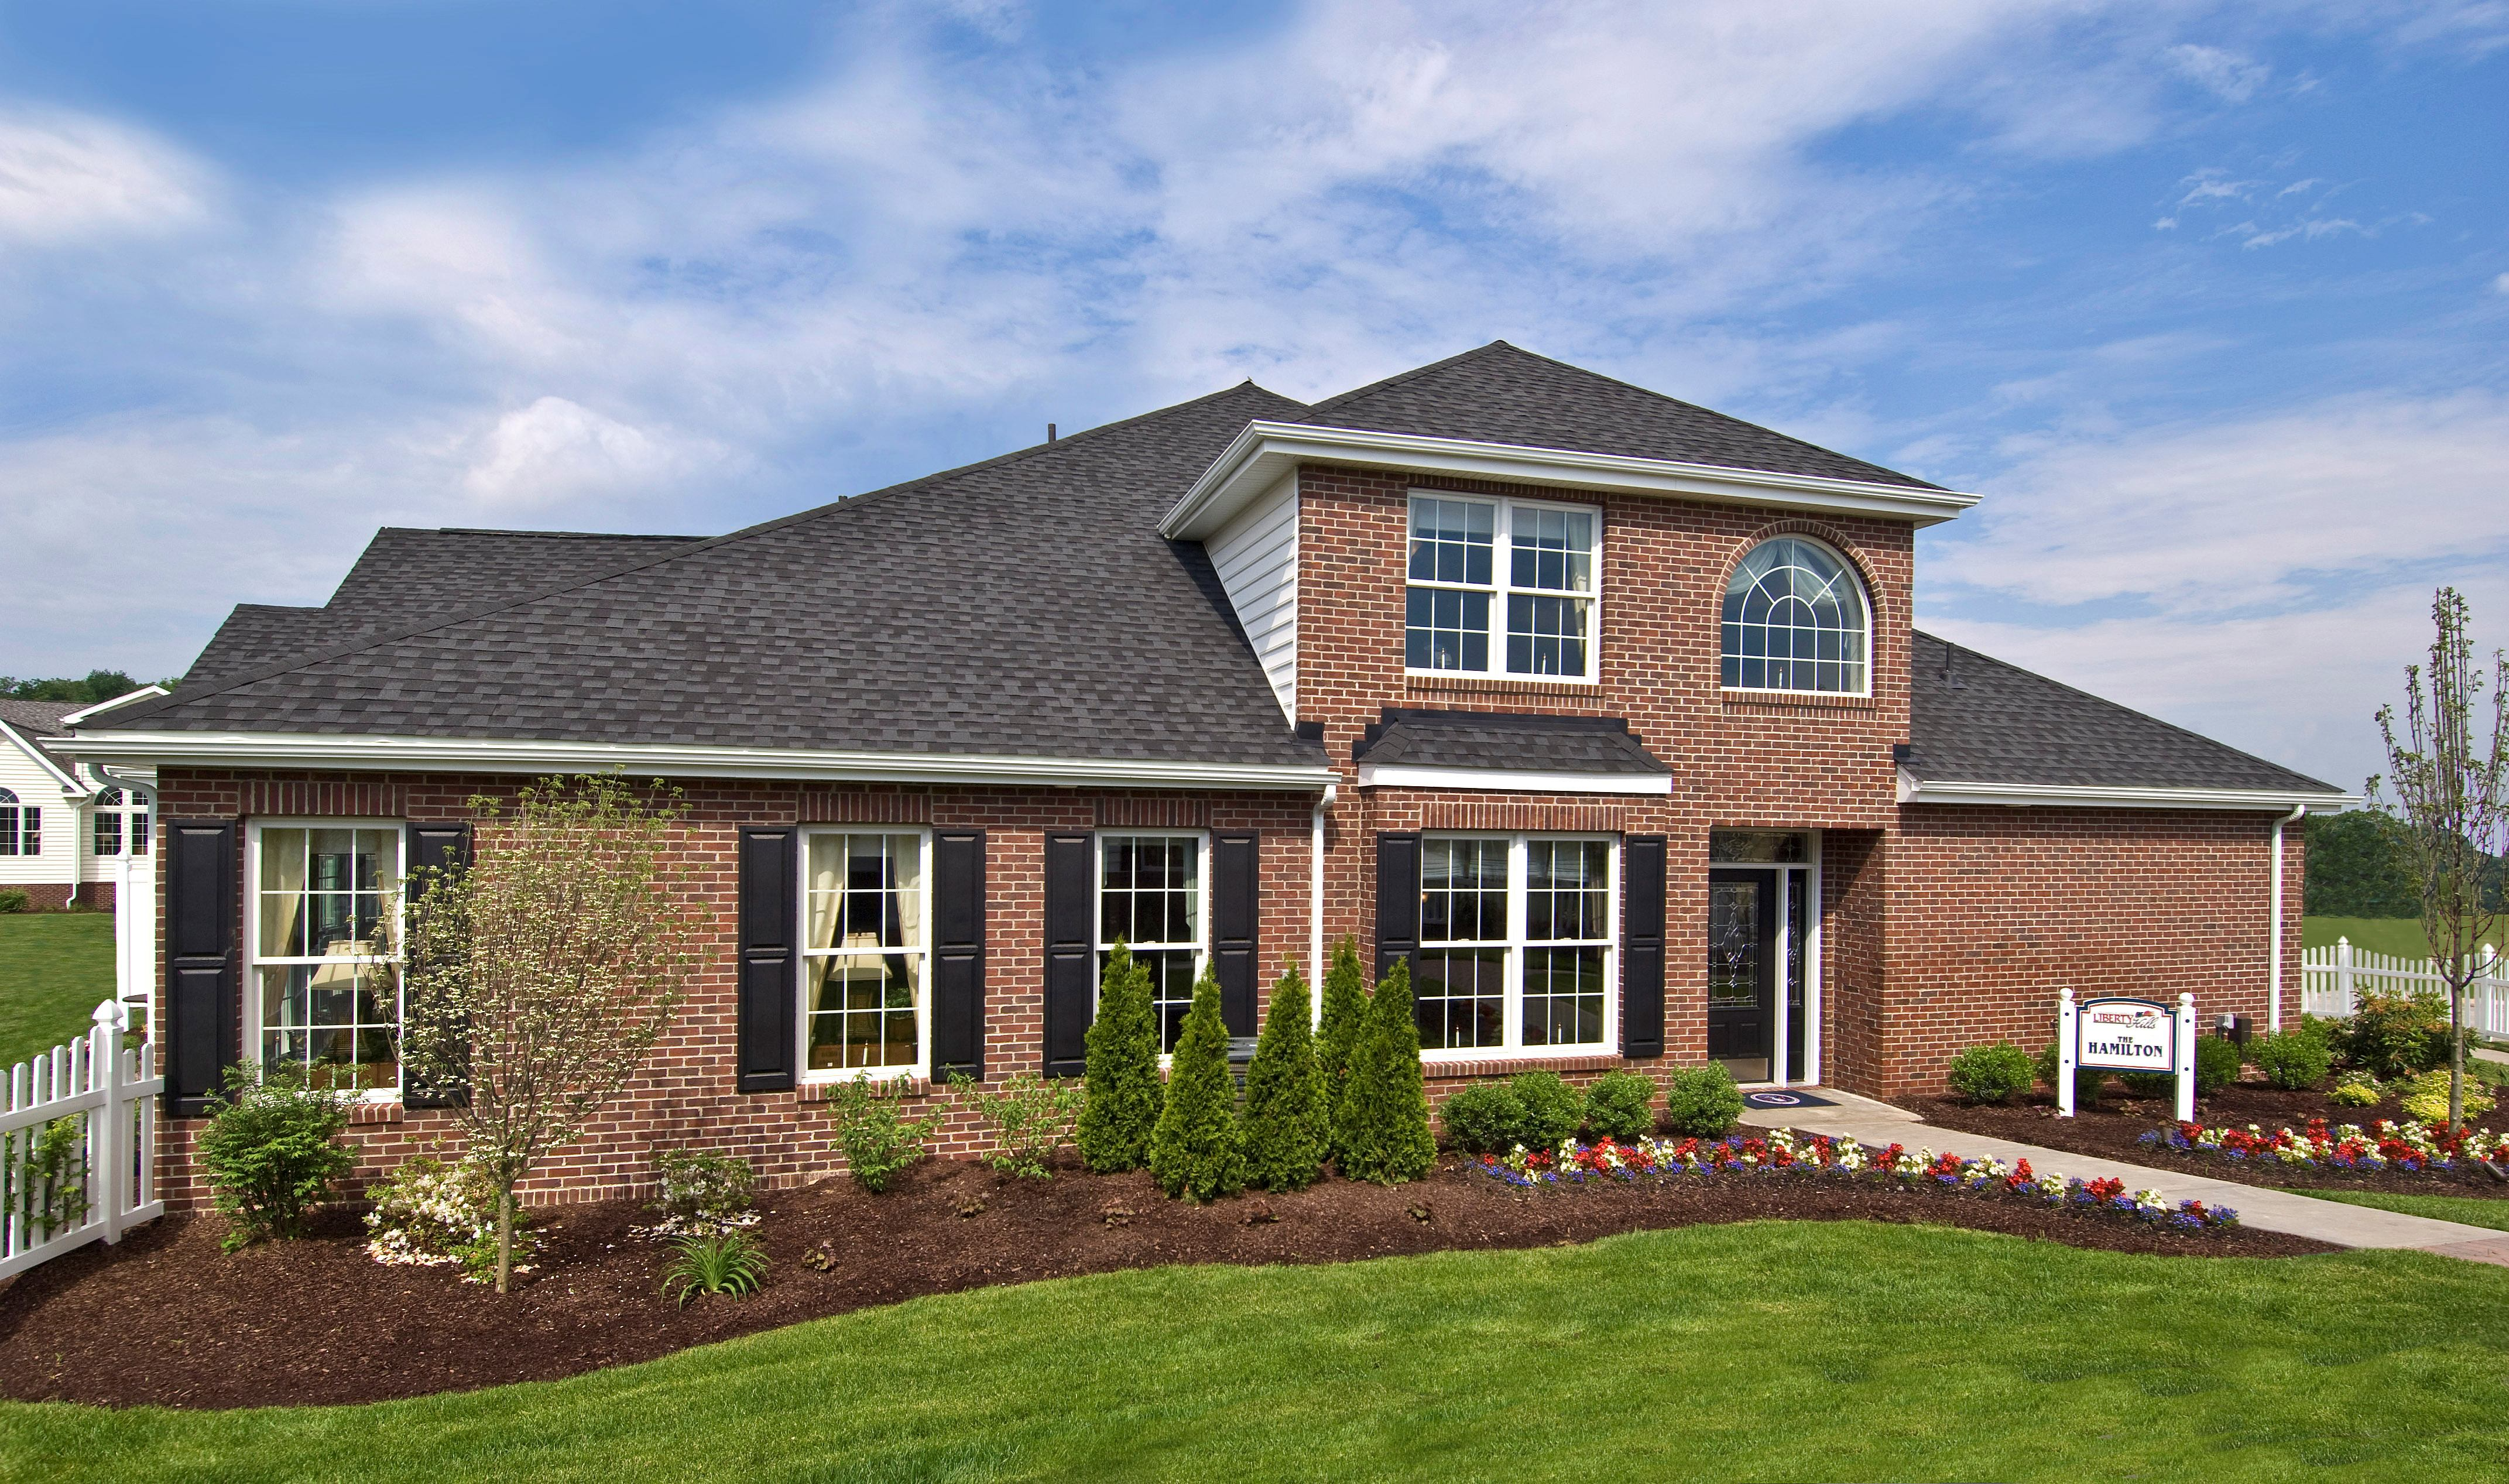 Active Adult Builder Sustains Buyer Demand With Resale Program